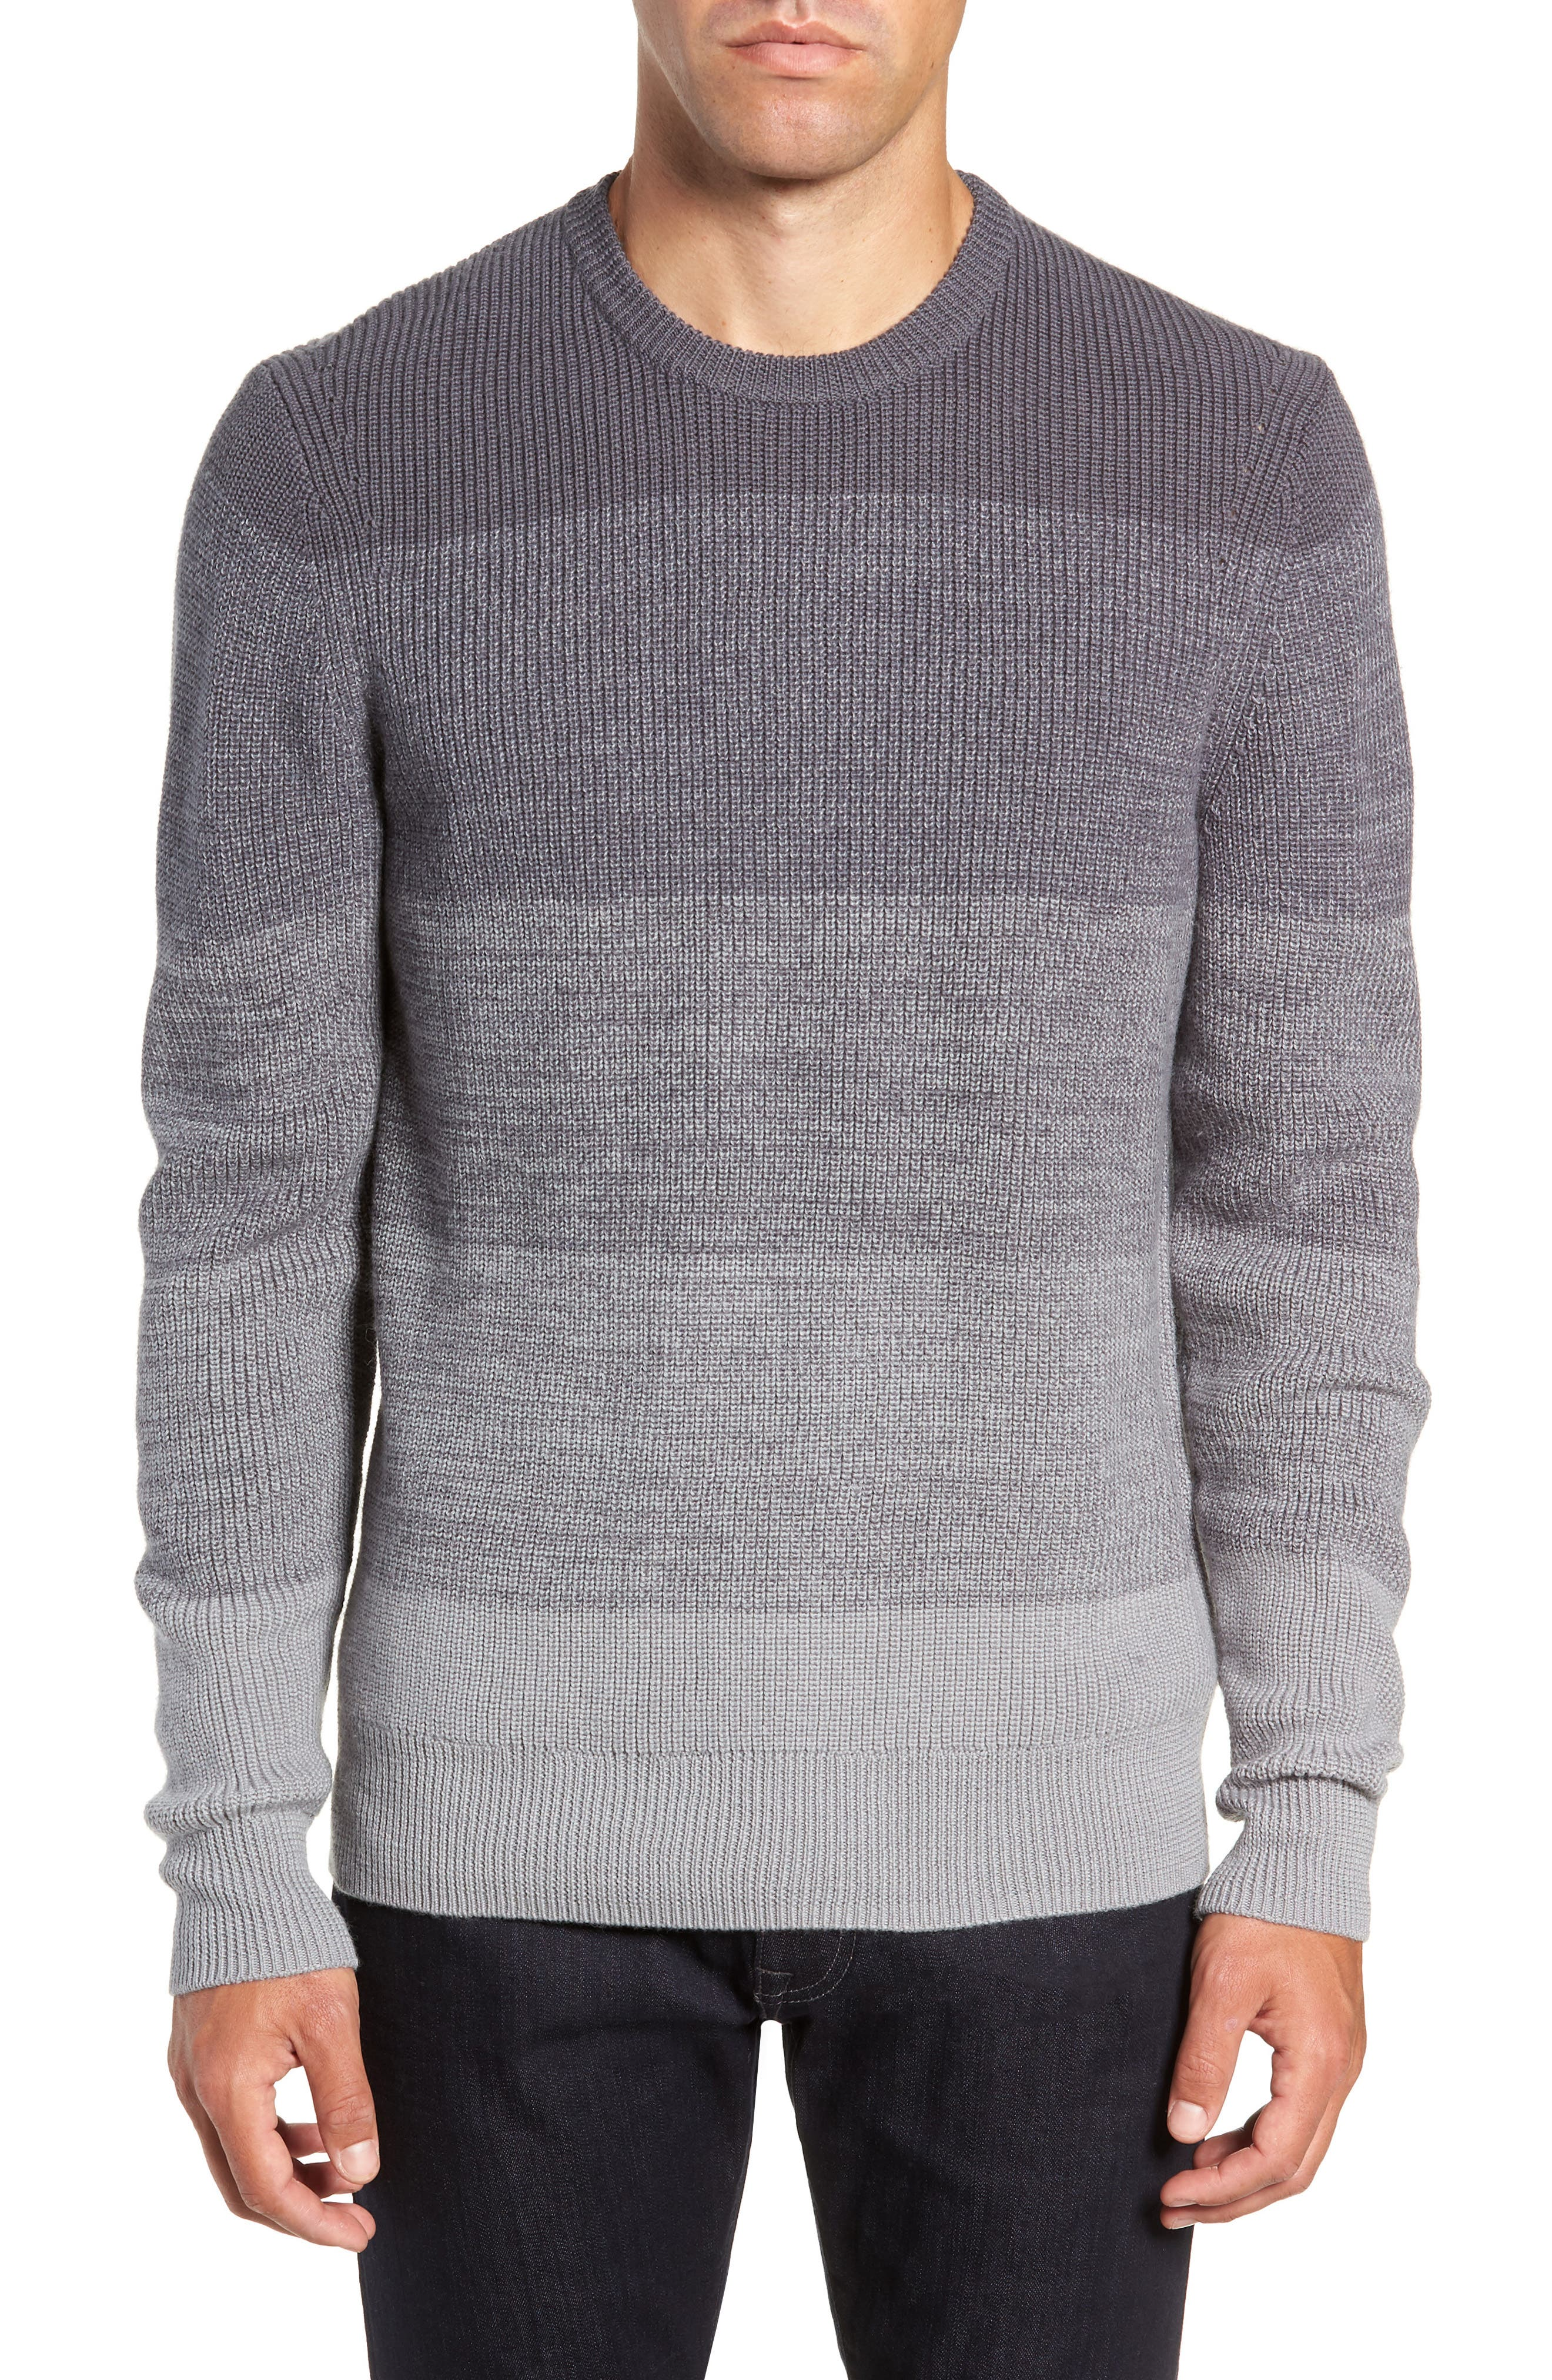 ZACHARY PRELL Fullterton Wool Blend Sweater in Grey